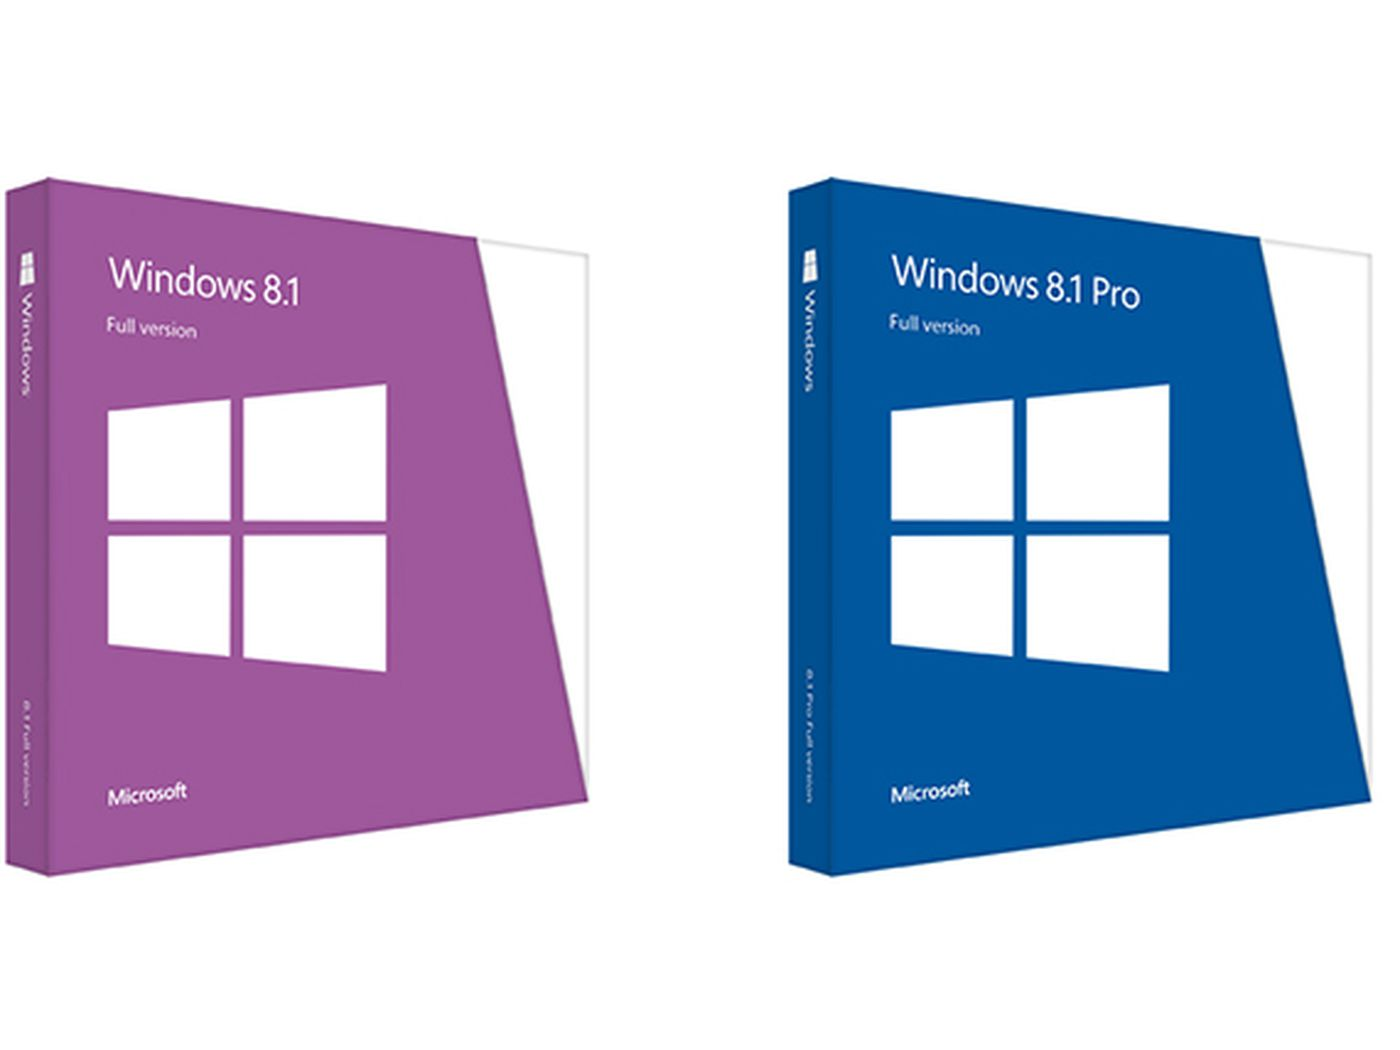 microsoft windows 8.1 latest update